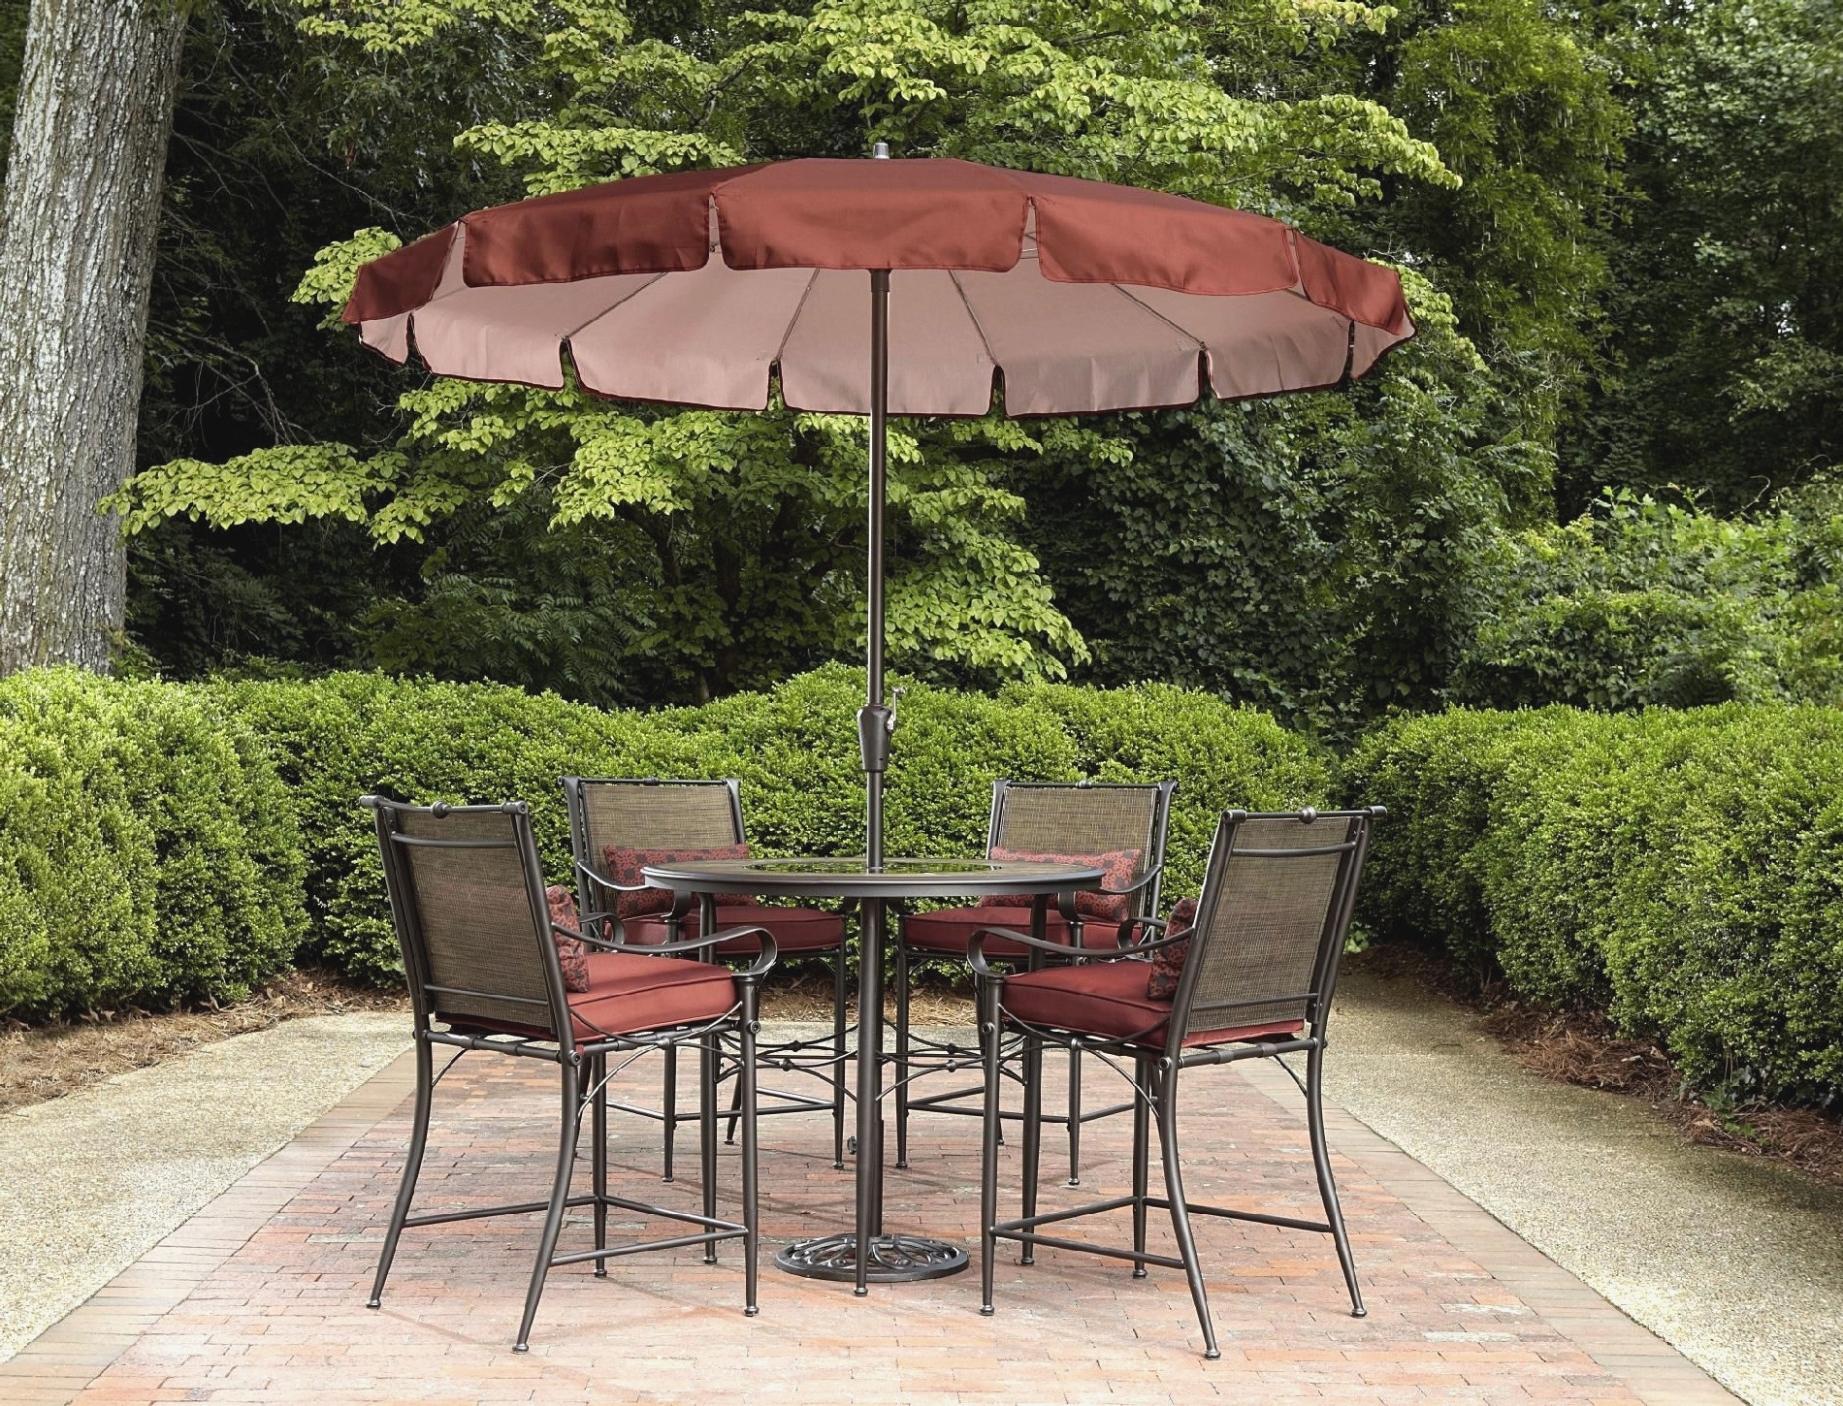 Popular Sears Patio Umbrellas Regarding Seven Things About Sears Patio (View 4 of 20)